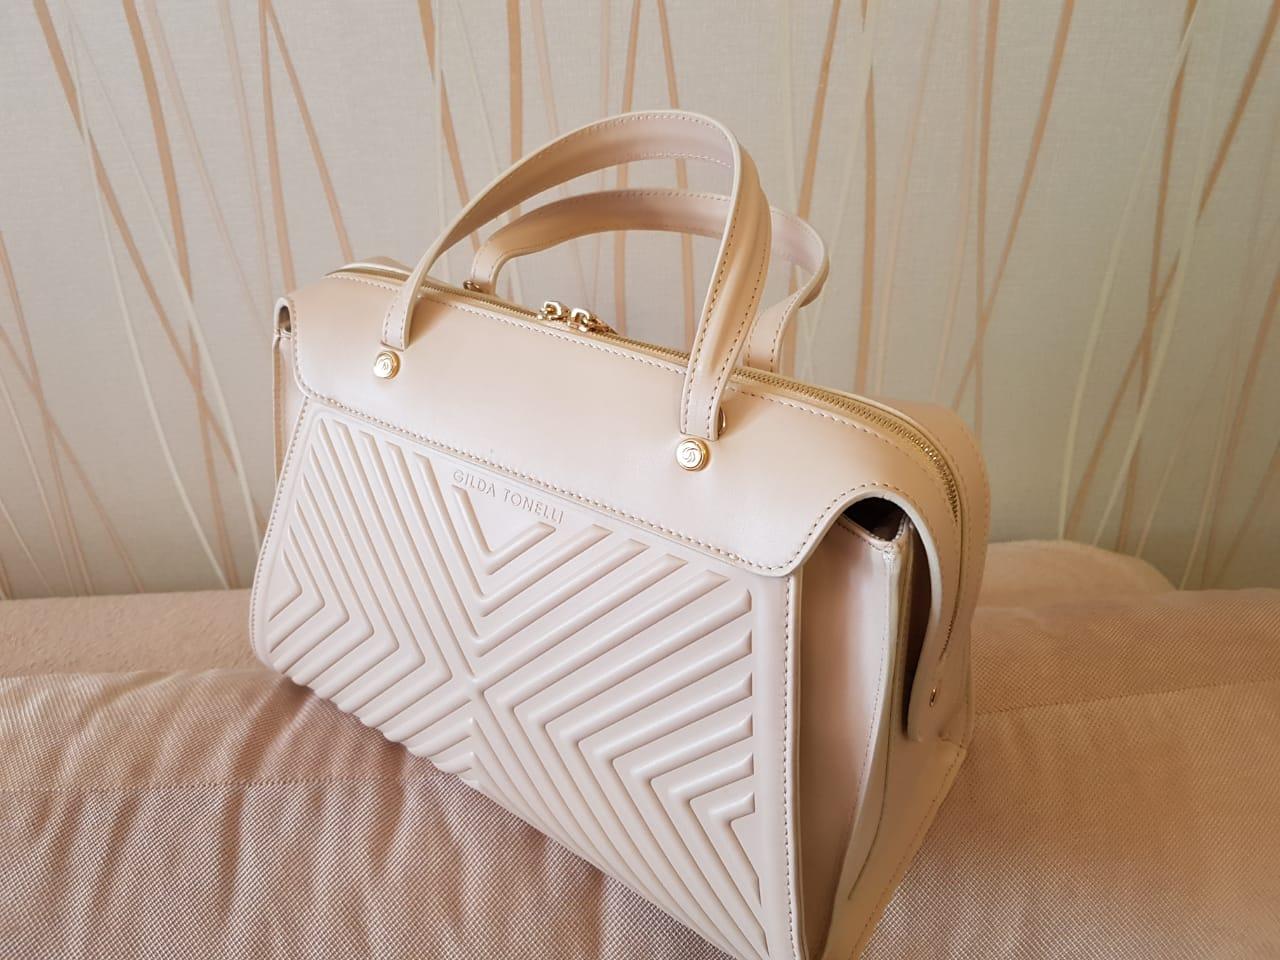 c73ce2472e2b It Parad: Итальянские сумки и аксессуары - Cromia, Ripani, Arcadia ...